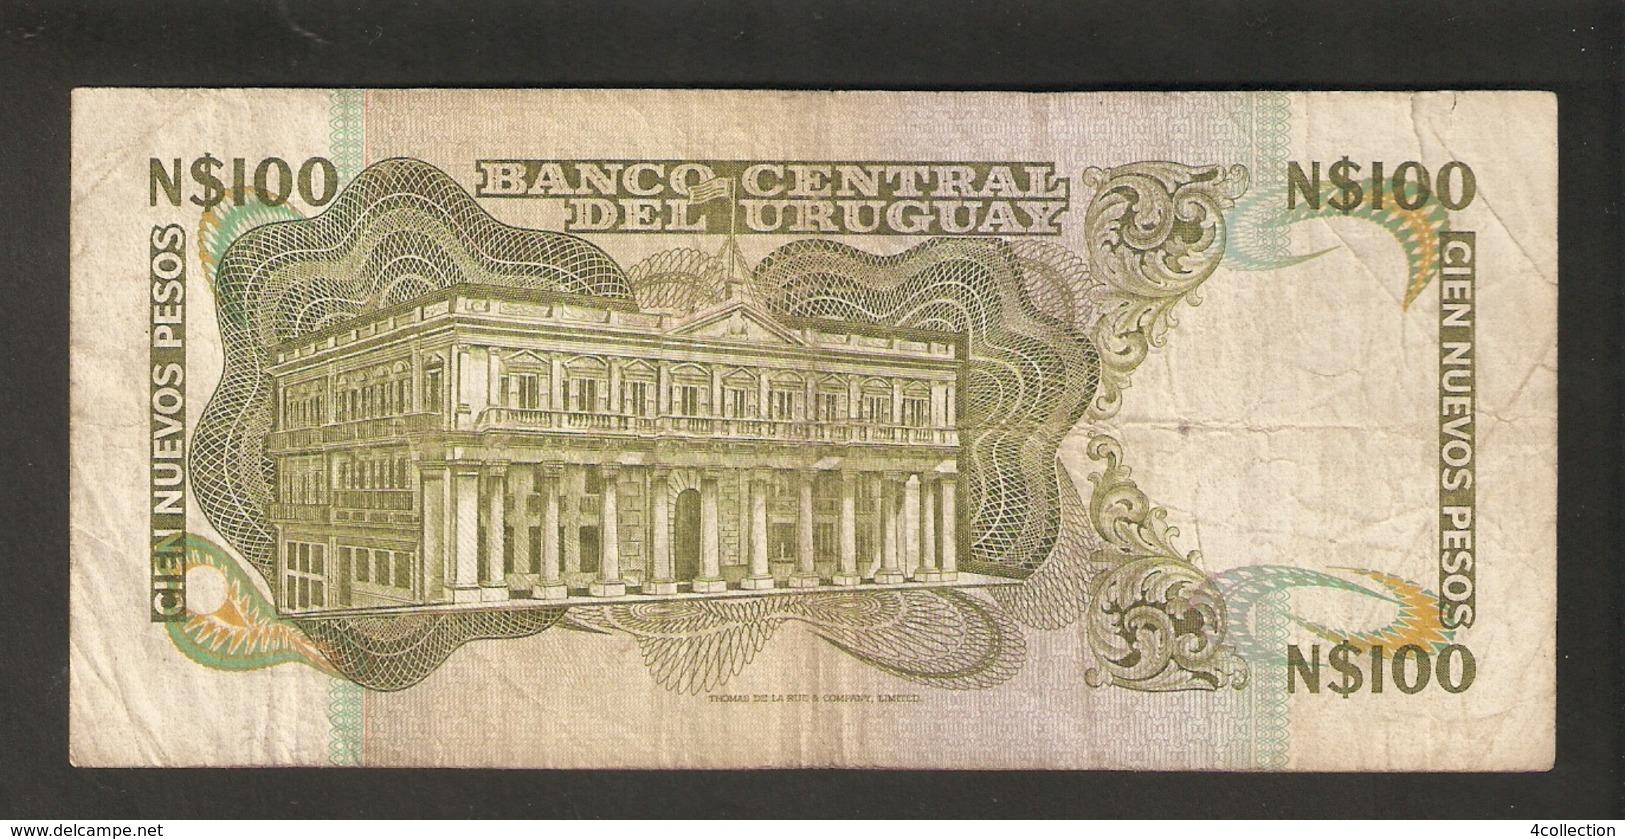 T.  URUGUAY N$100 Cien Nuevos Pesos 1987 Ser. G  13391002 - Uruguay